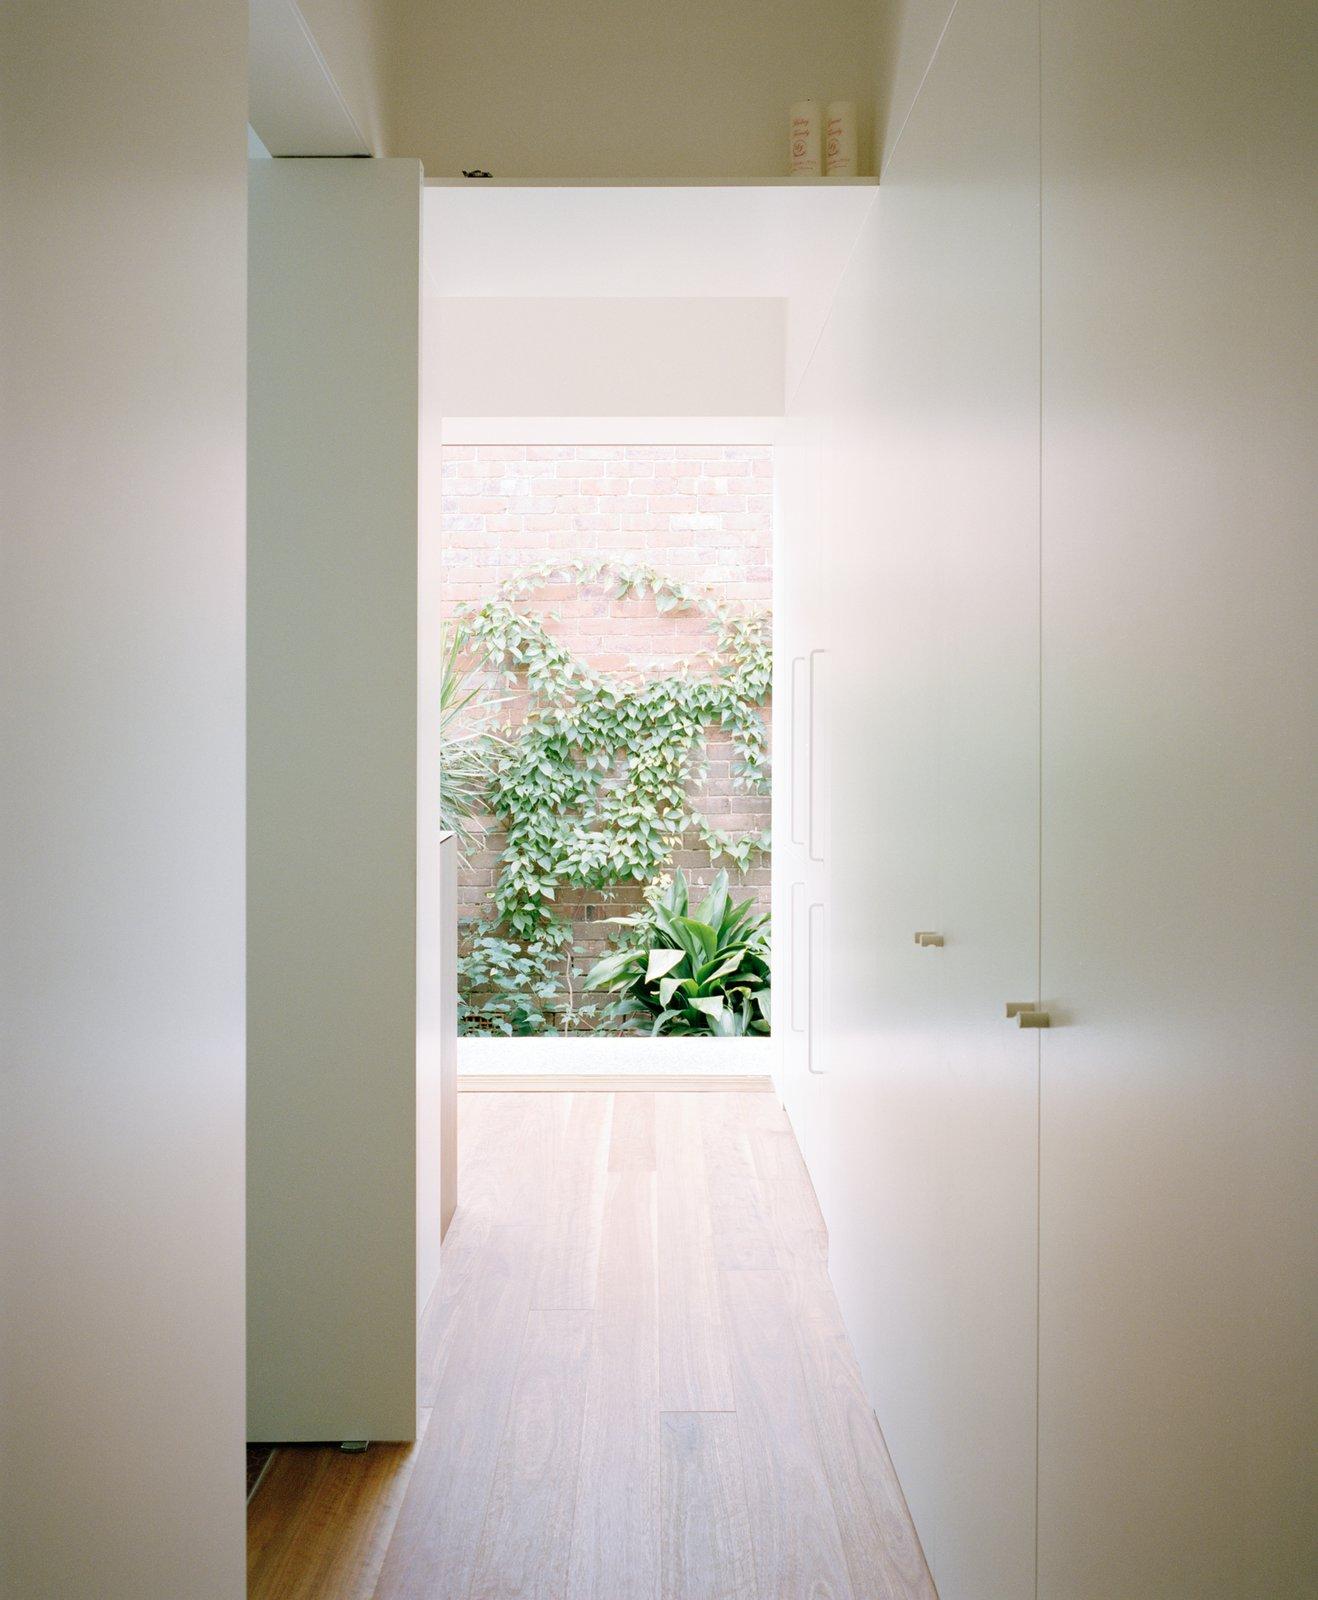 Corridor of JJ House by Bokey Grant